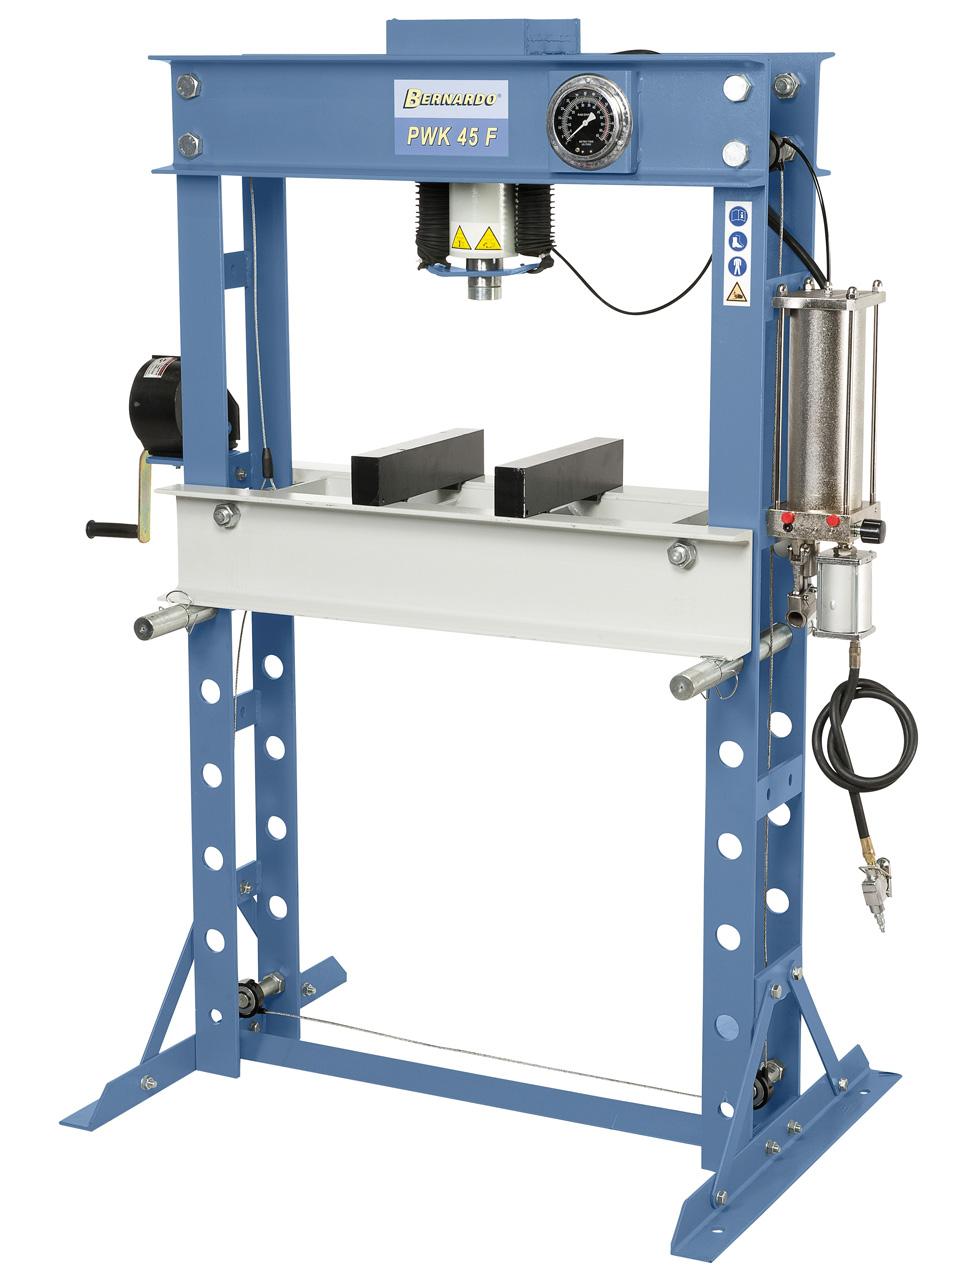 PWK 45 F Presse pneumatisk